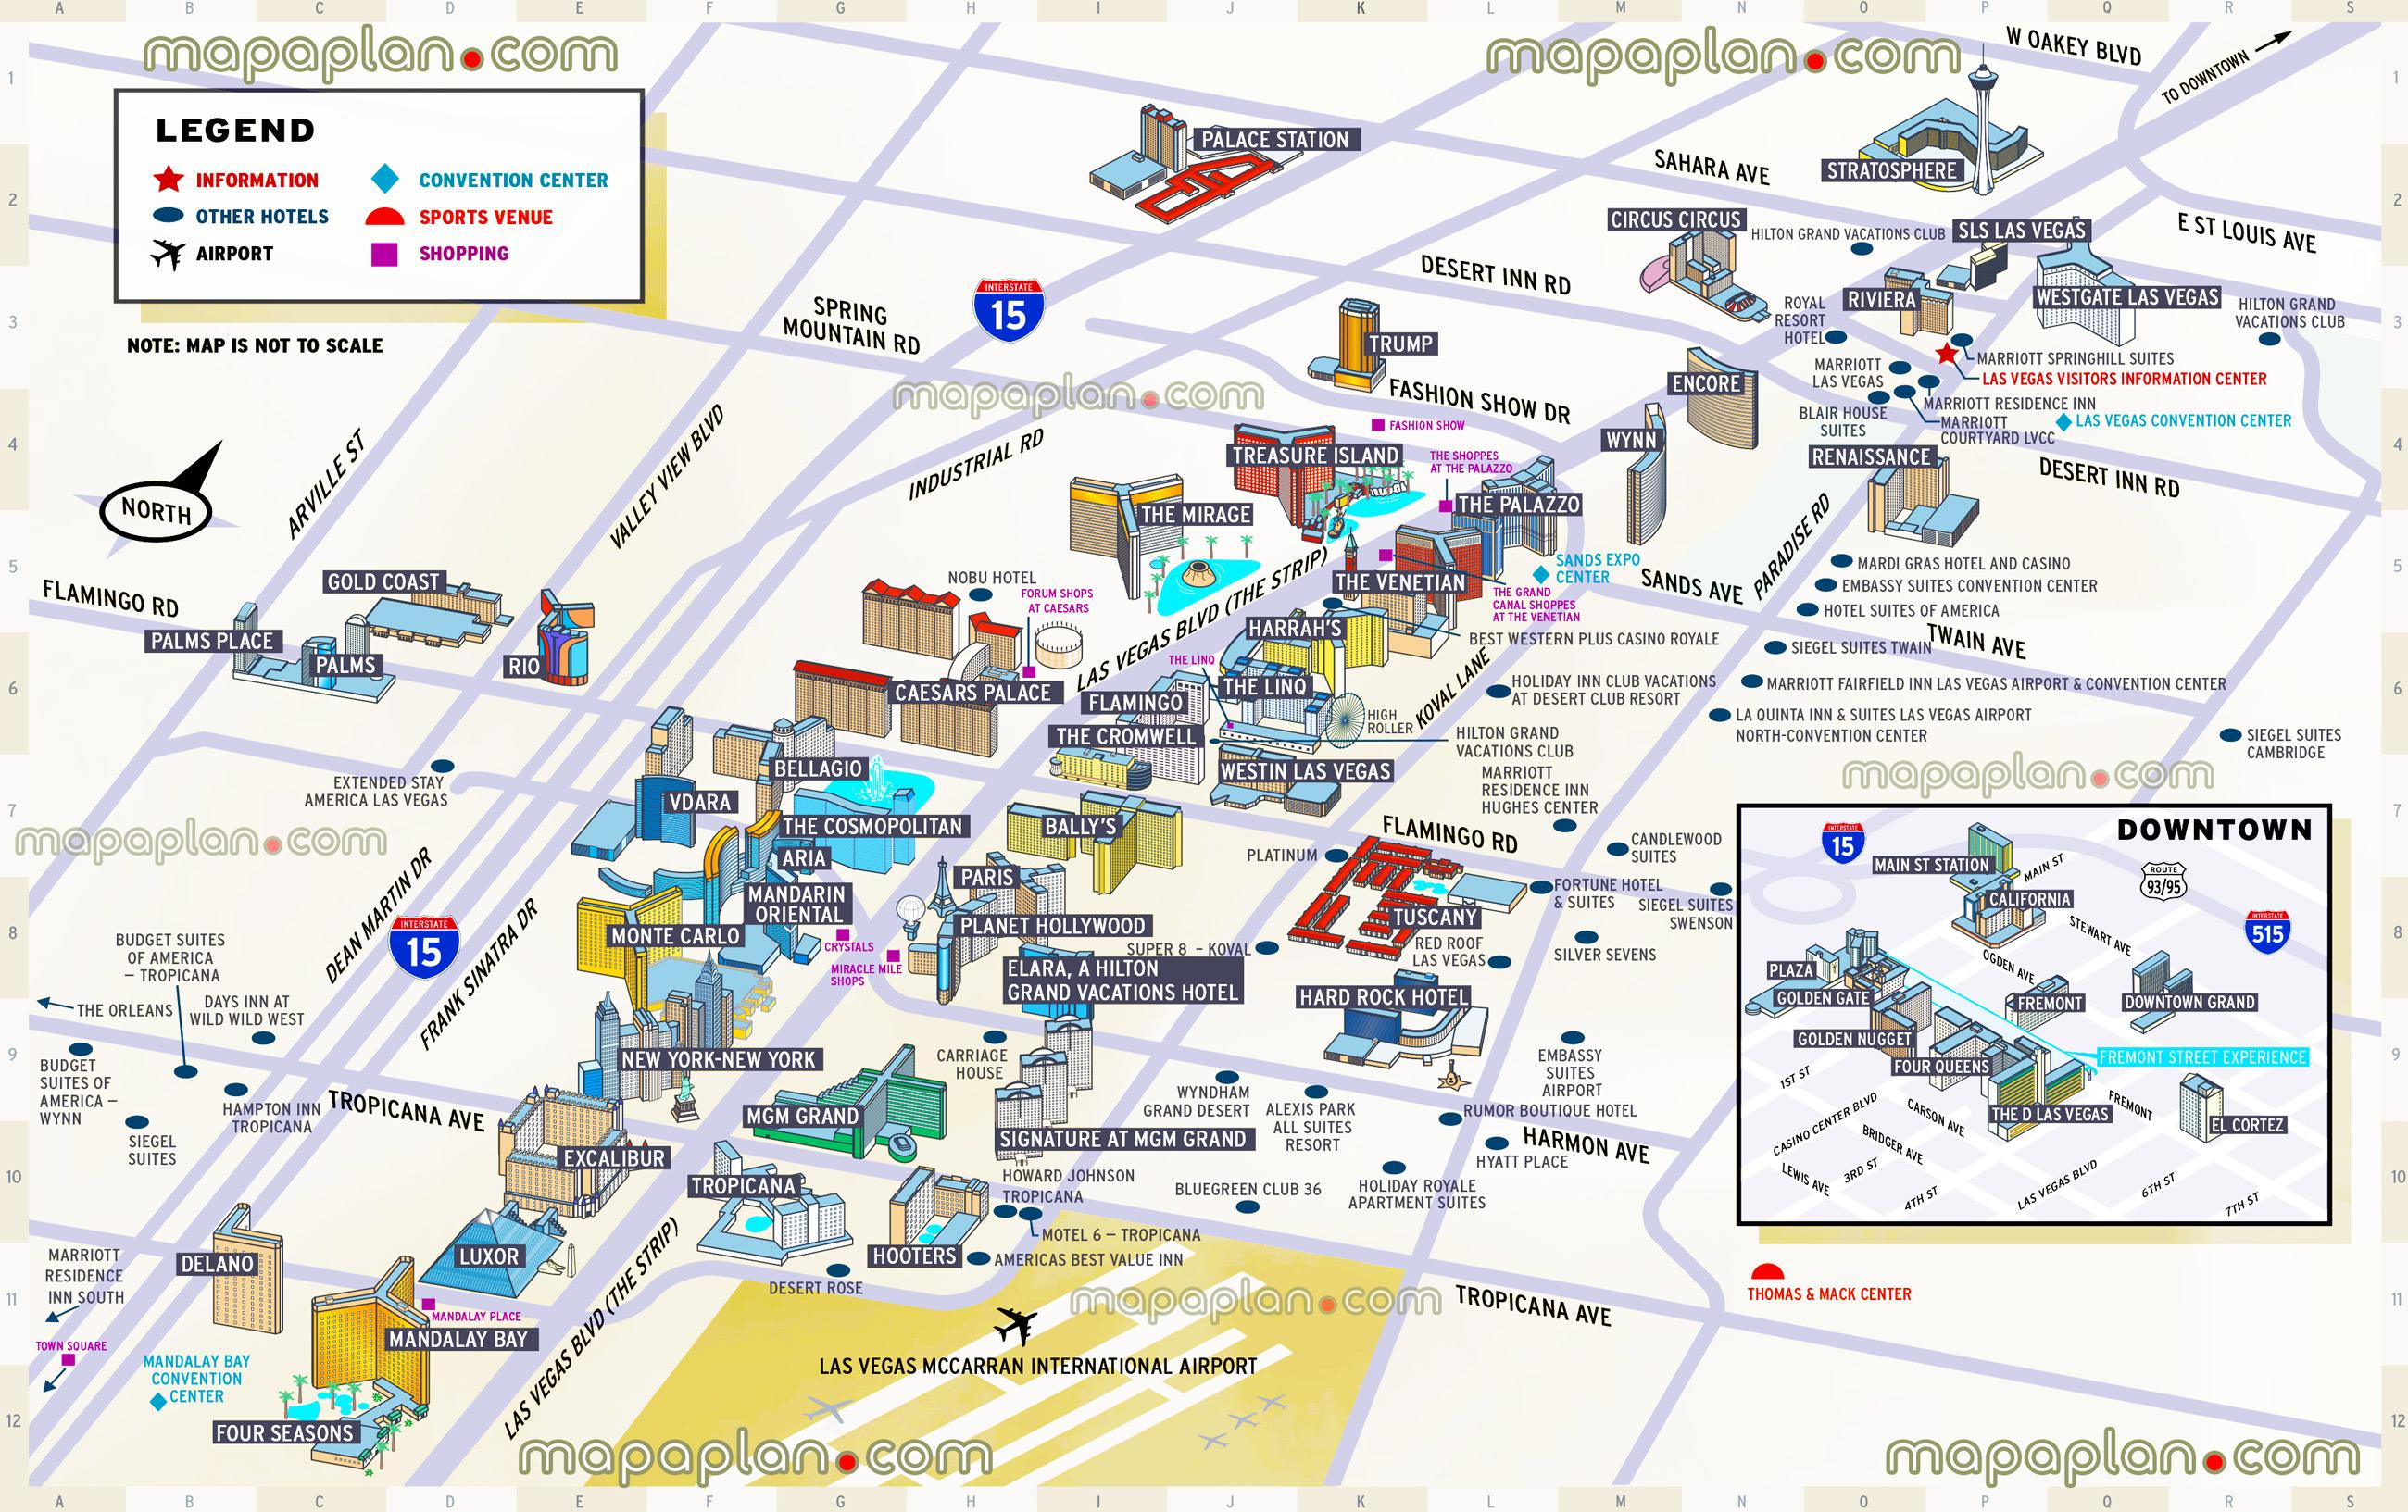 Map Of Las Vegas Casinos My Blog Inside California - Touran - Casinos In California Map